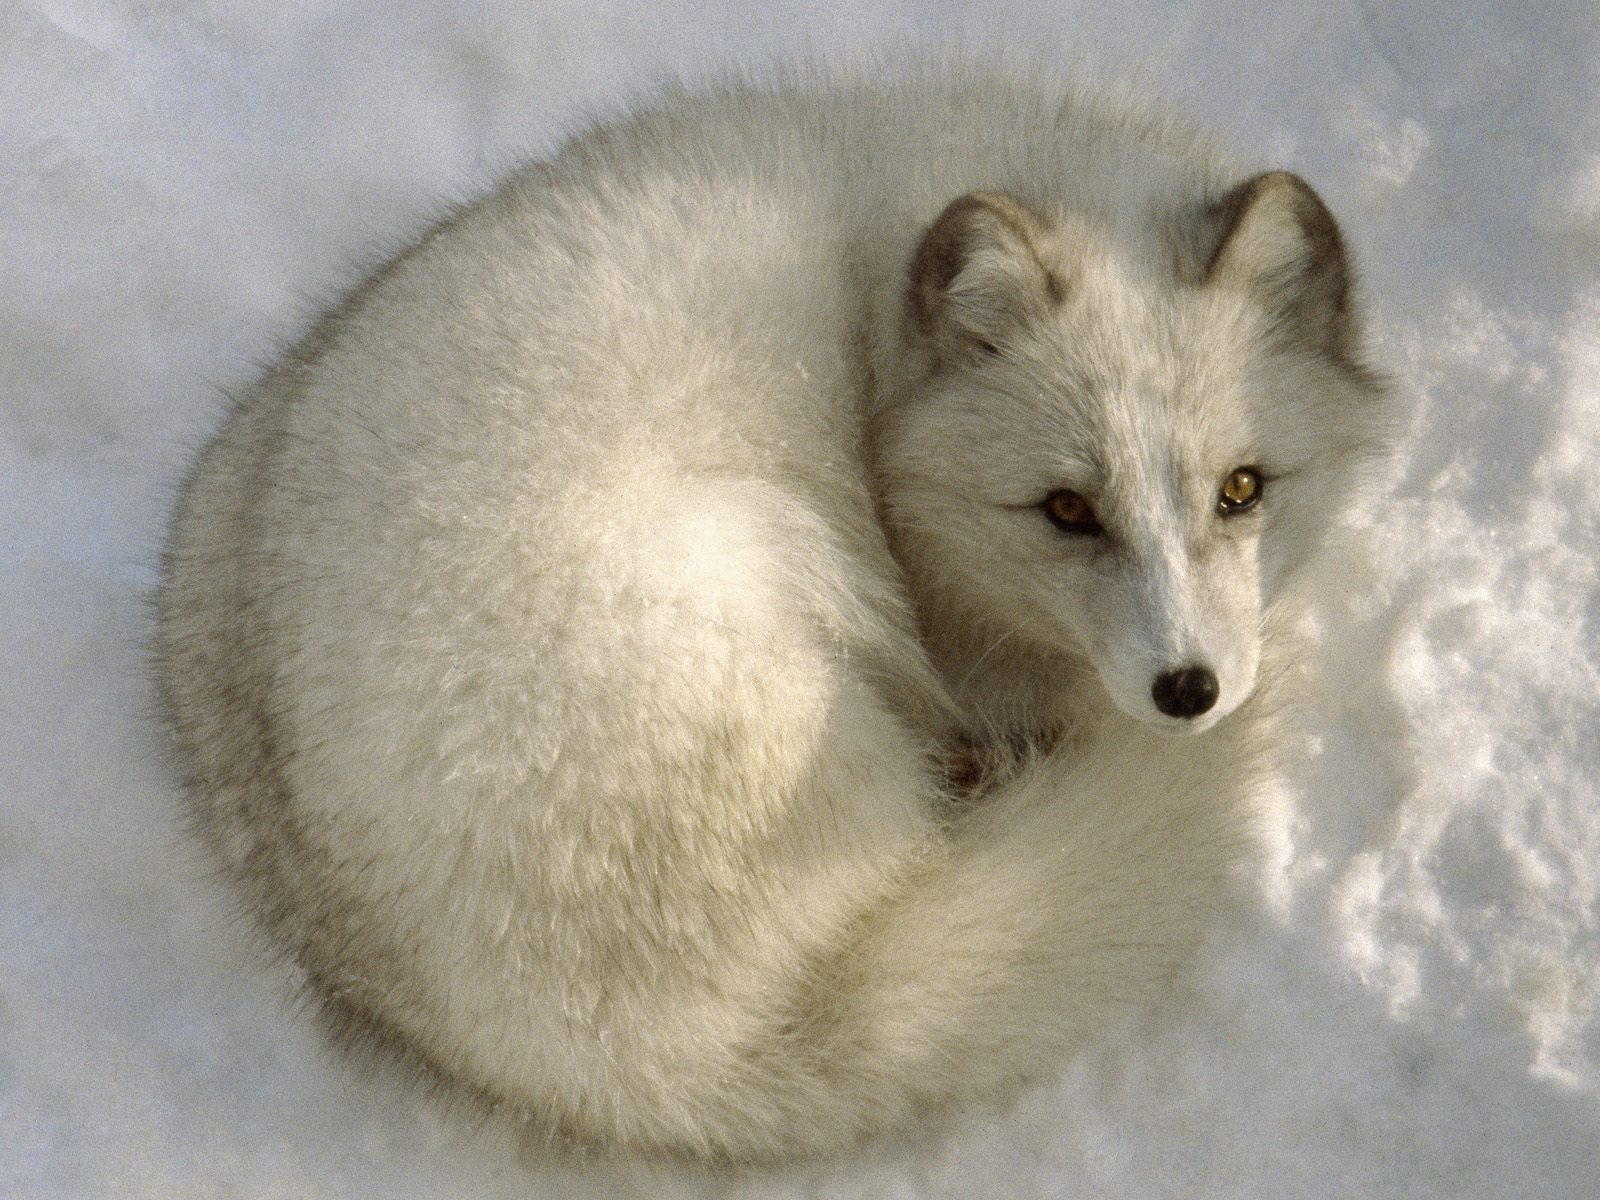 http://1.bp.blogspot.com/-gabhBiP62pY/TdZjQxKL4DI/AAAAAAAAGXg/BY3o21ivax4/s1600/Arctic-Fox-wallpaper.jpg